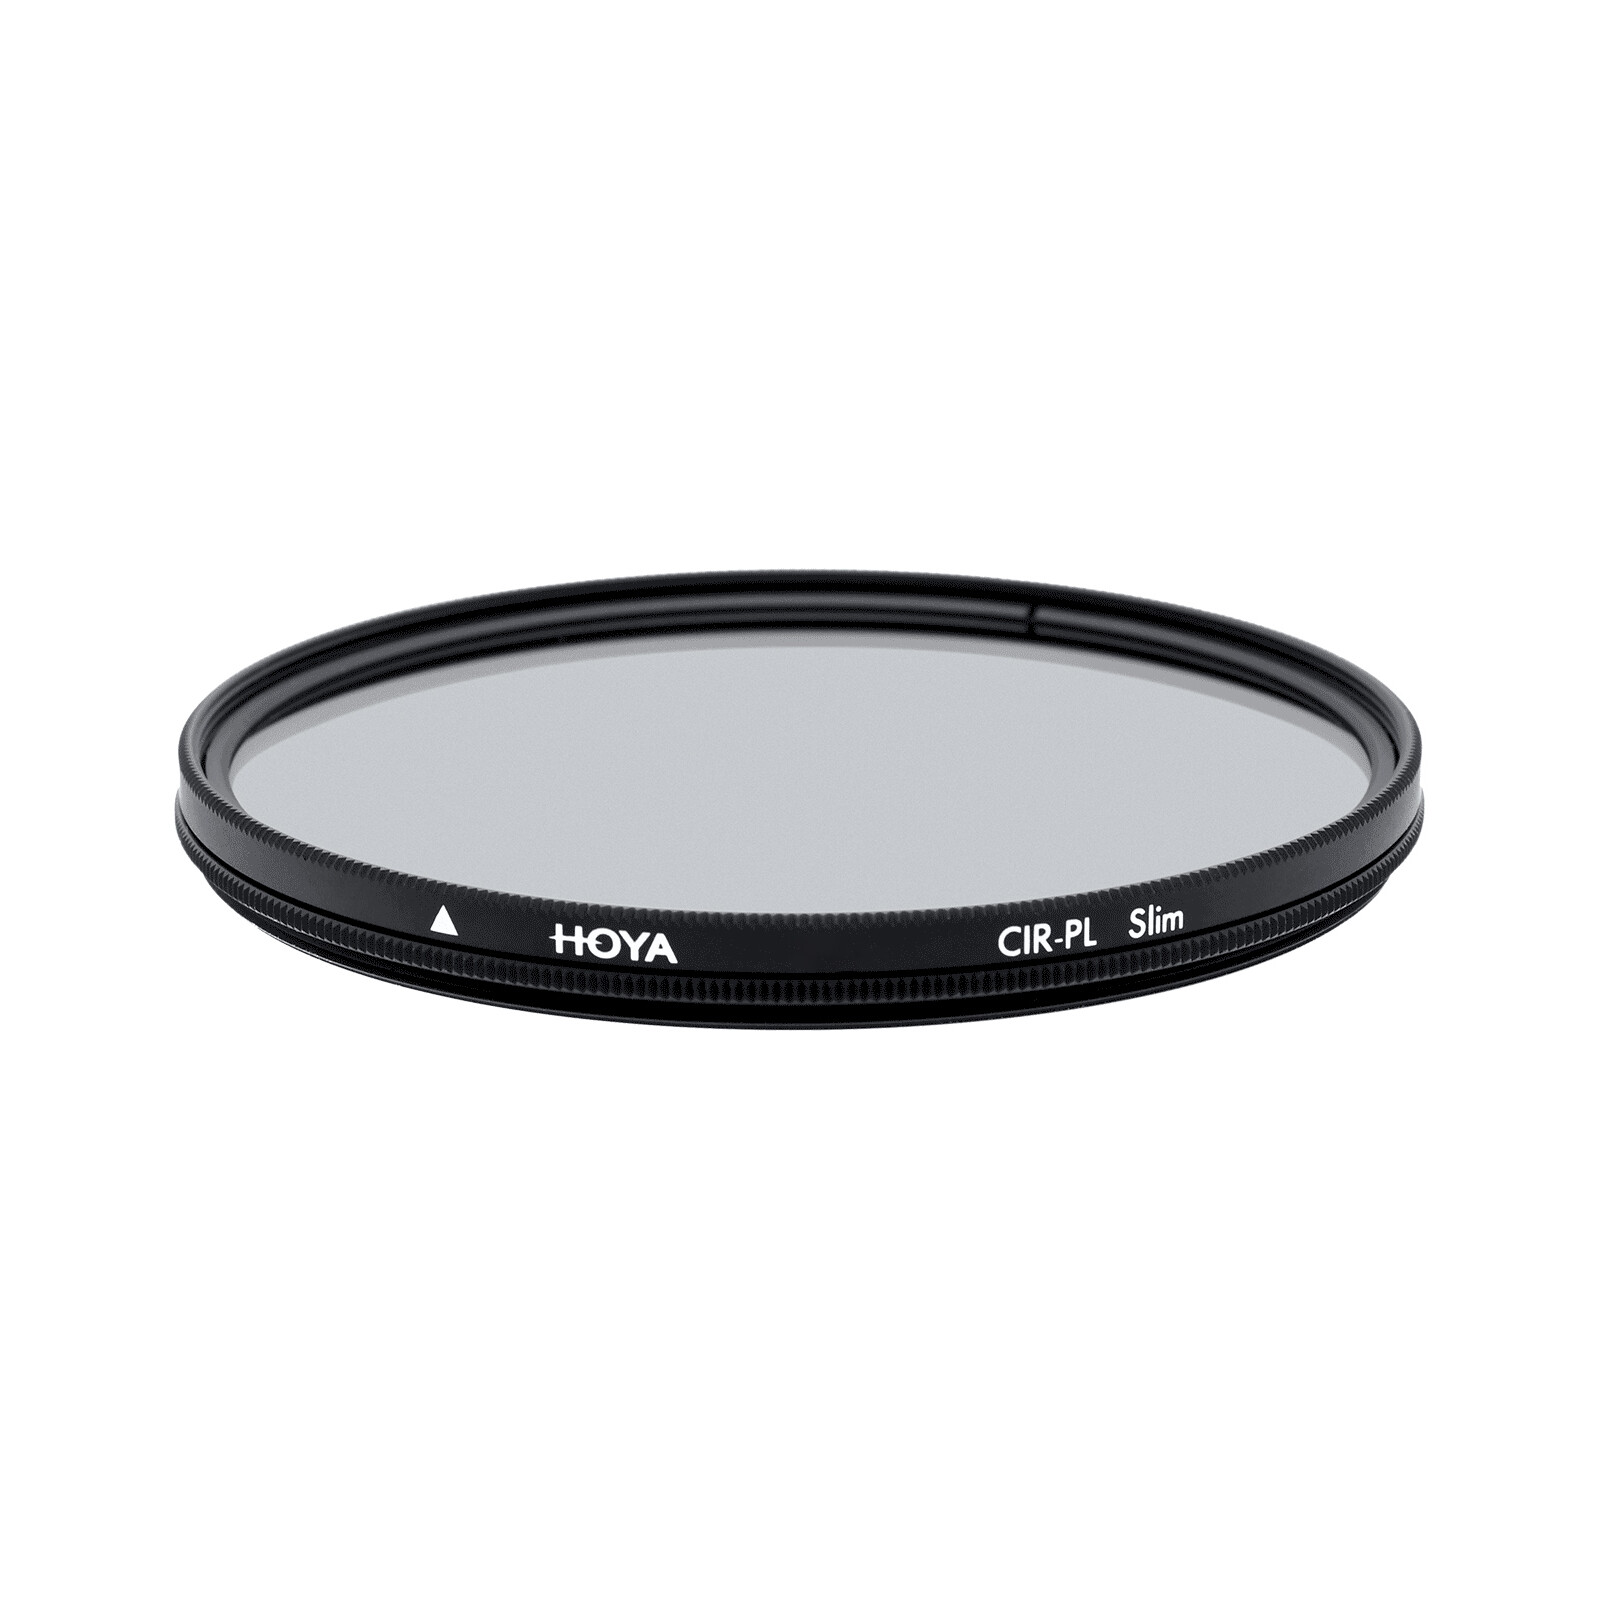 Hoya POL Circular 52mm Slim